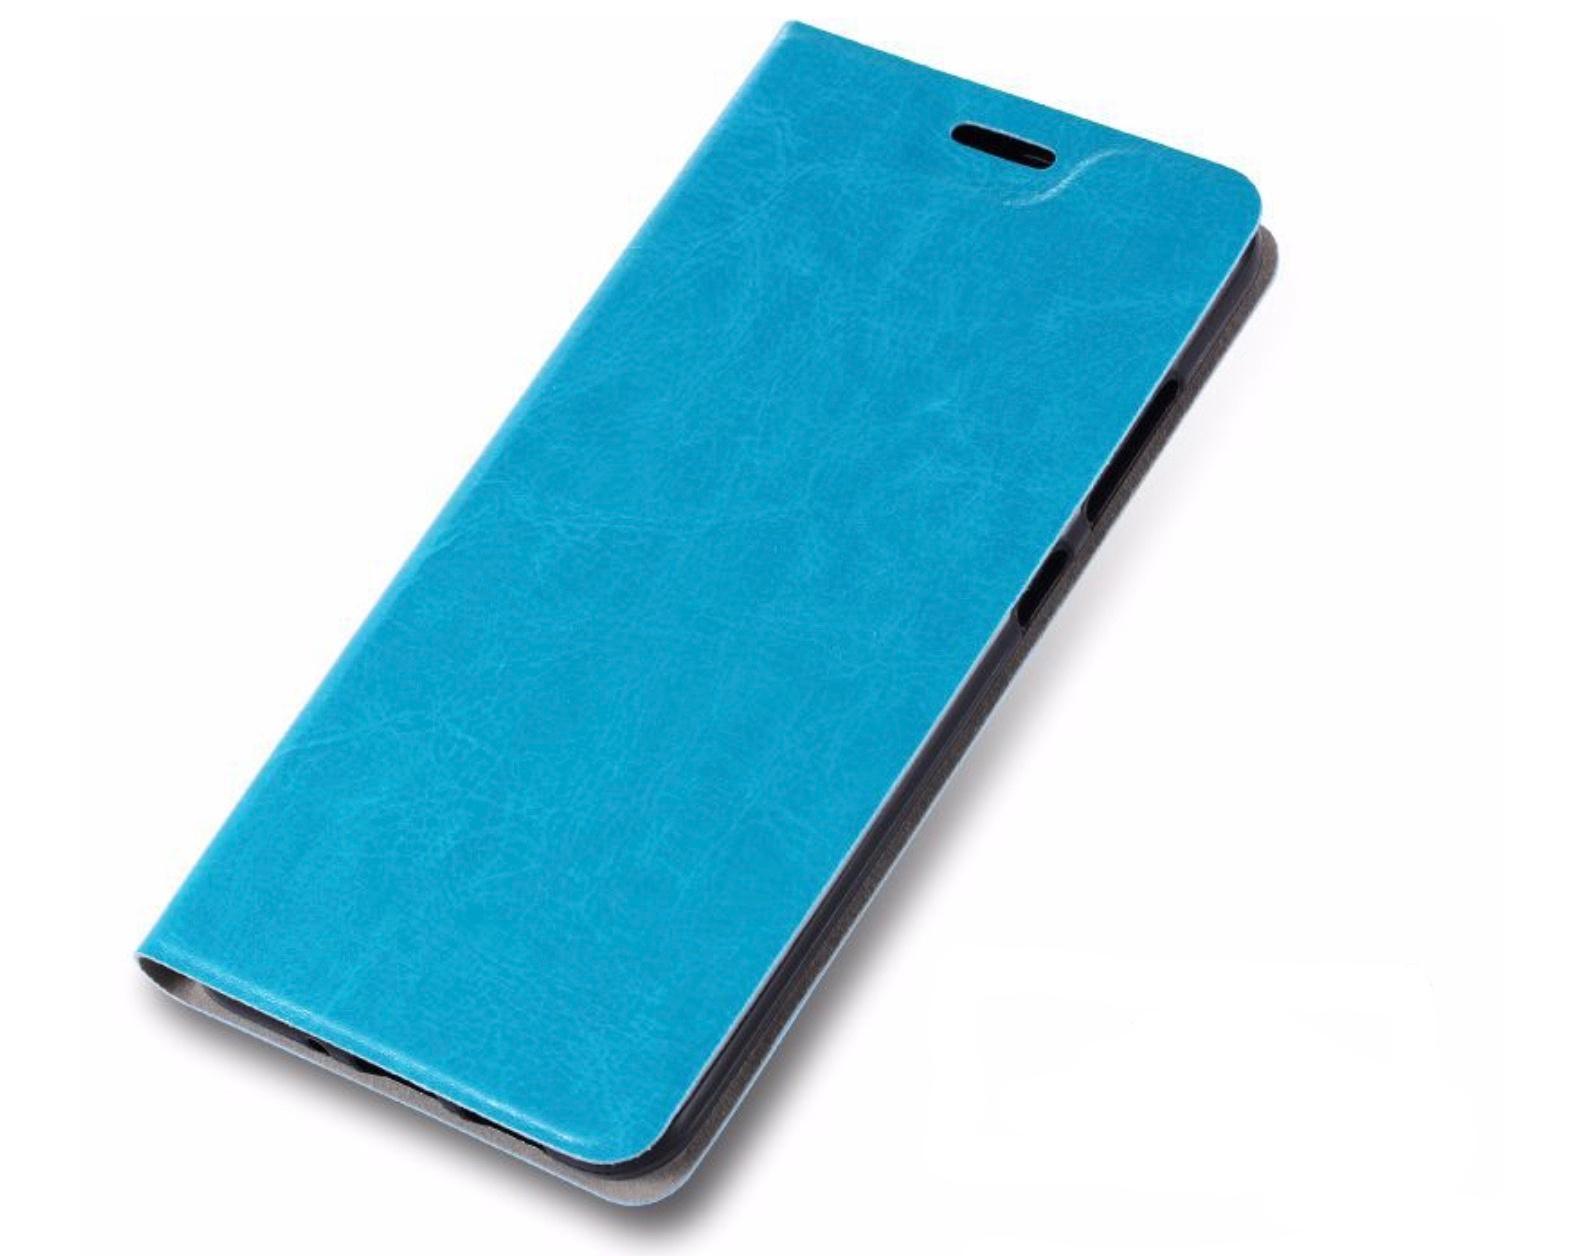 Чехол-книжка MyPads для Sony Xperia E5 на жёсткой металлической основе бирюзовый